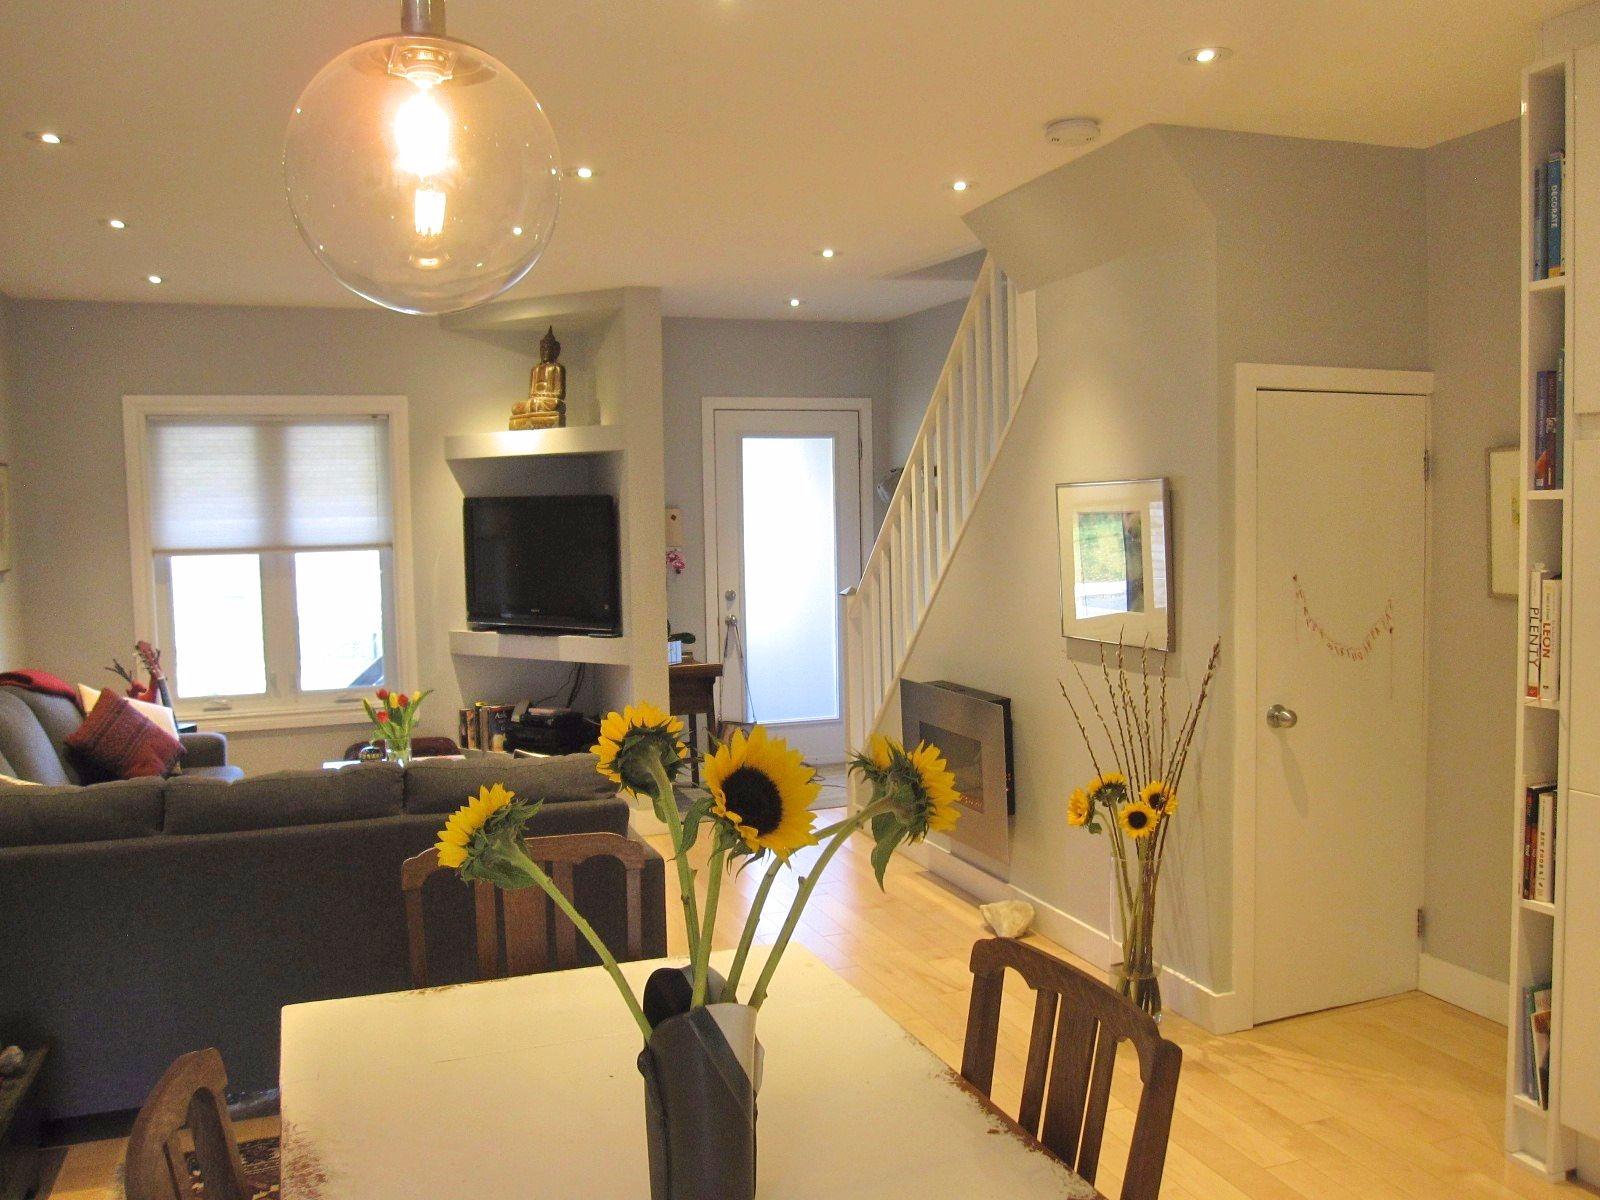 746 Brock Ave Clean Modern Fully Furnished 2 Bedroom Home